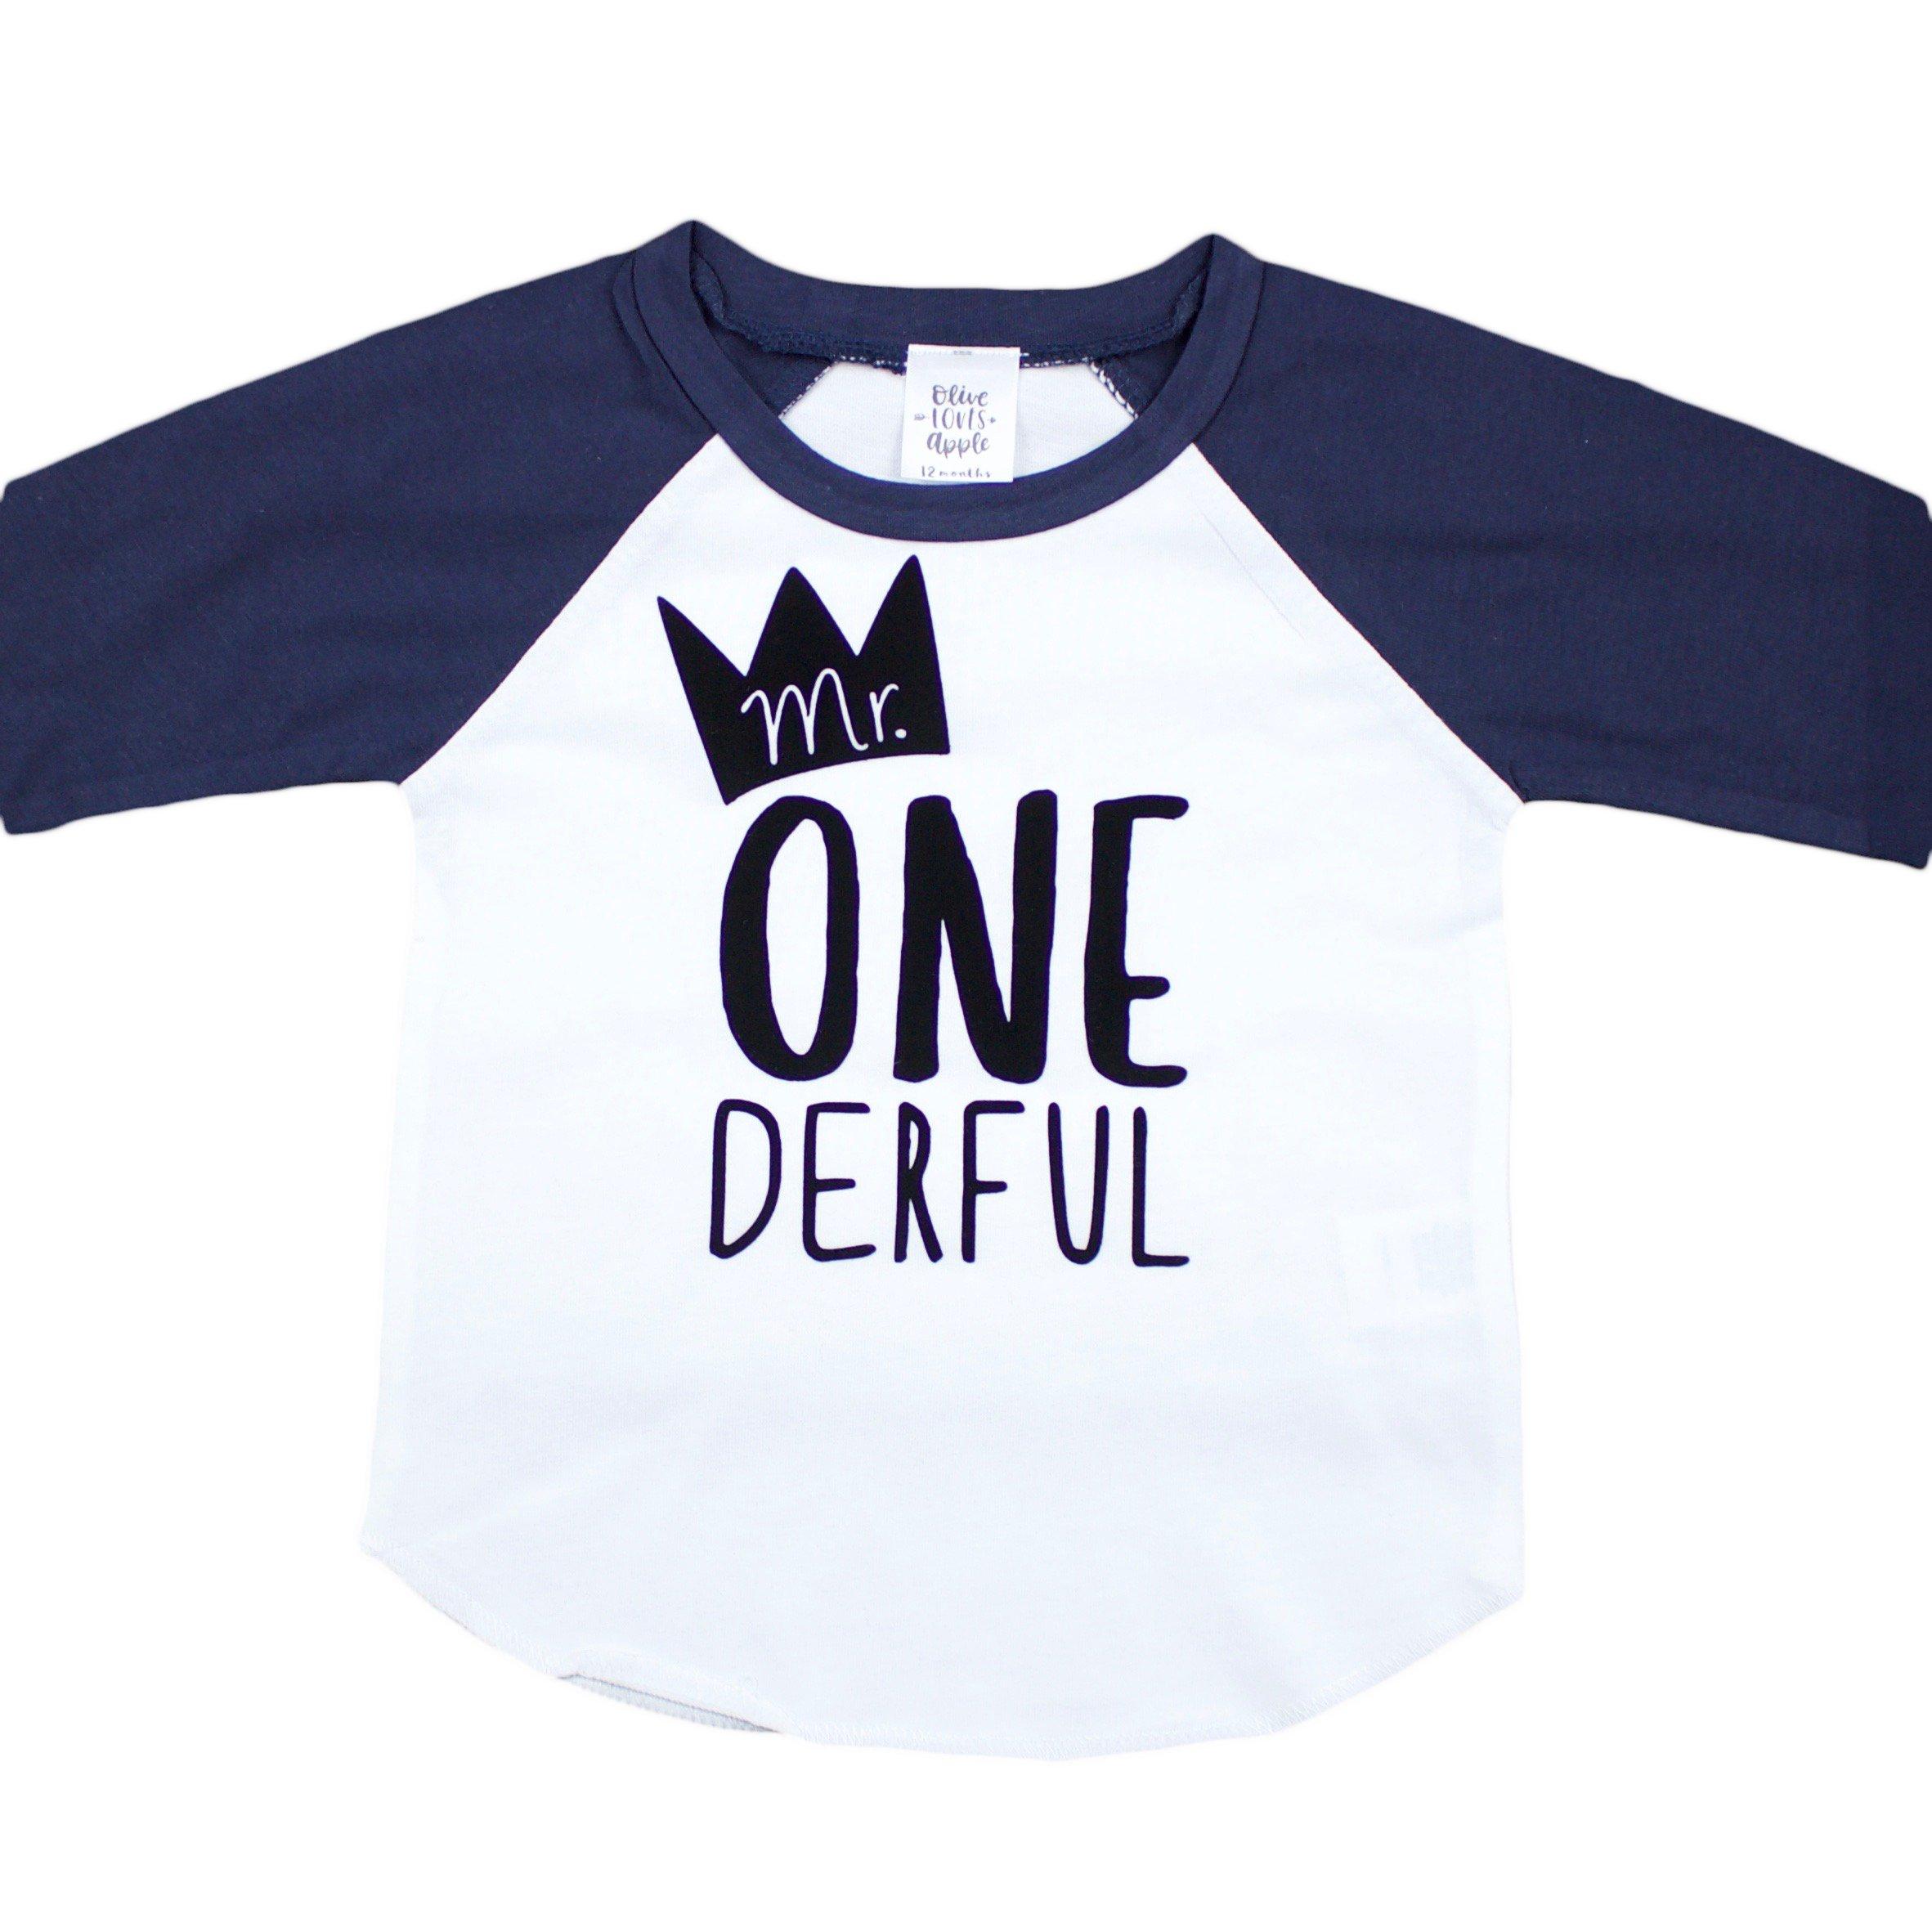 Mr One-Derful Baseball Tee Shirt for Boys 1st Birthday Shirt, Navy, 12 Months